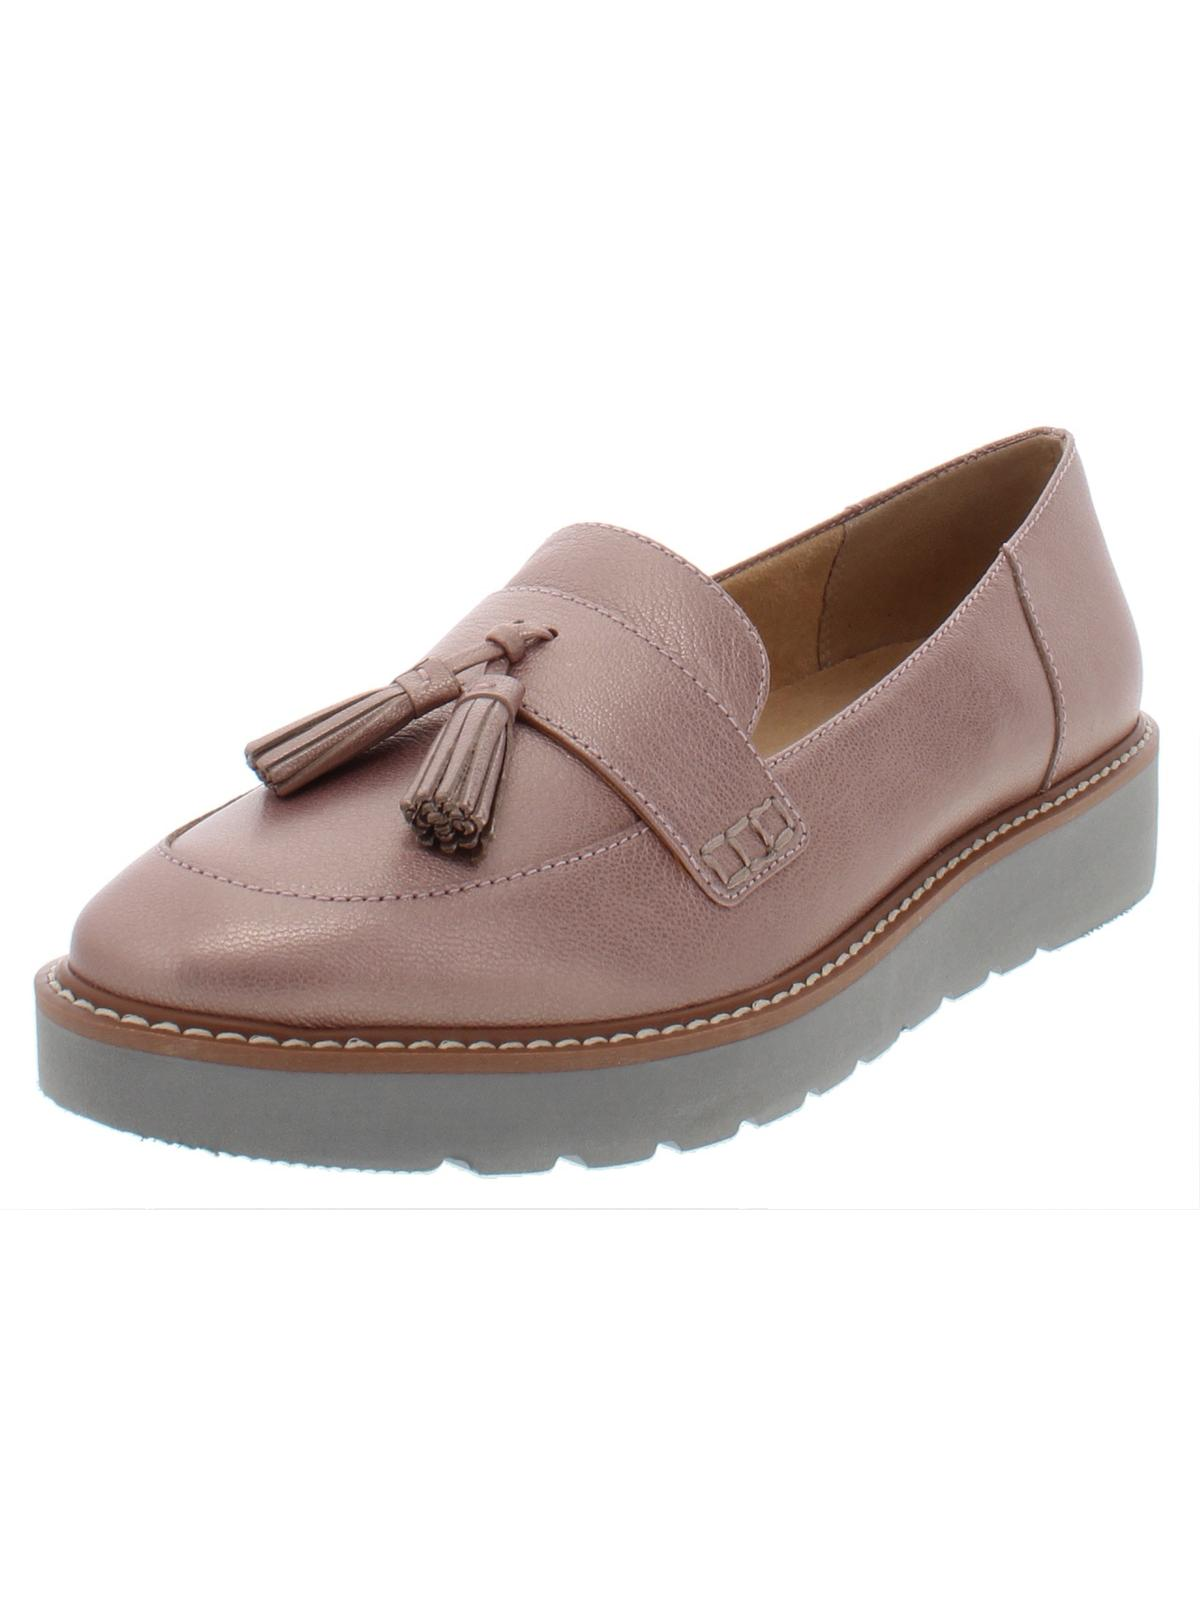 August Tassel Platform Loafers